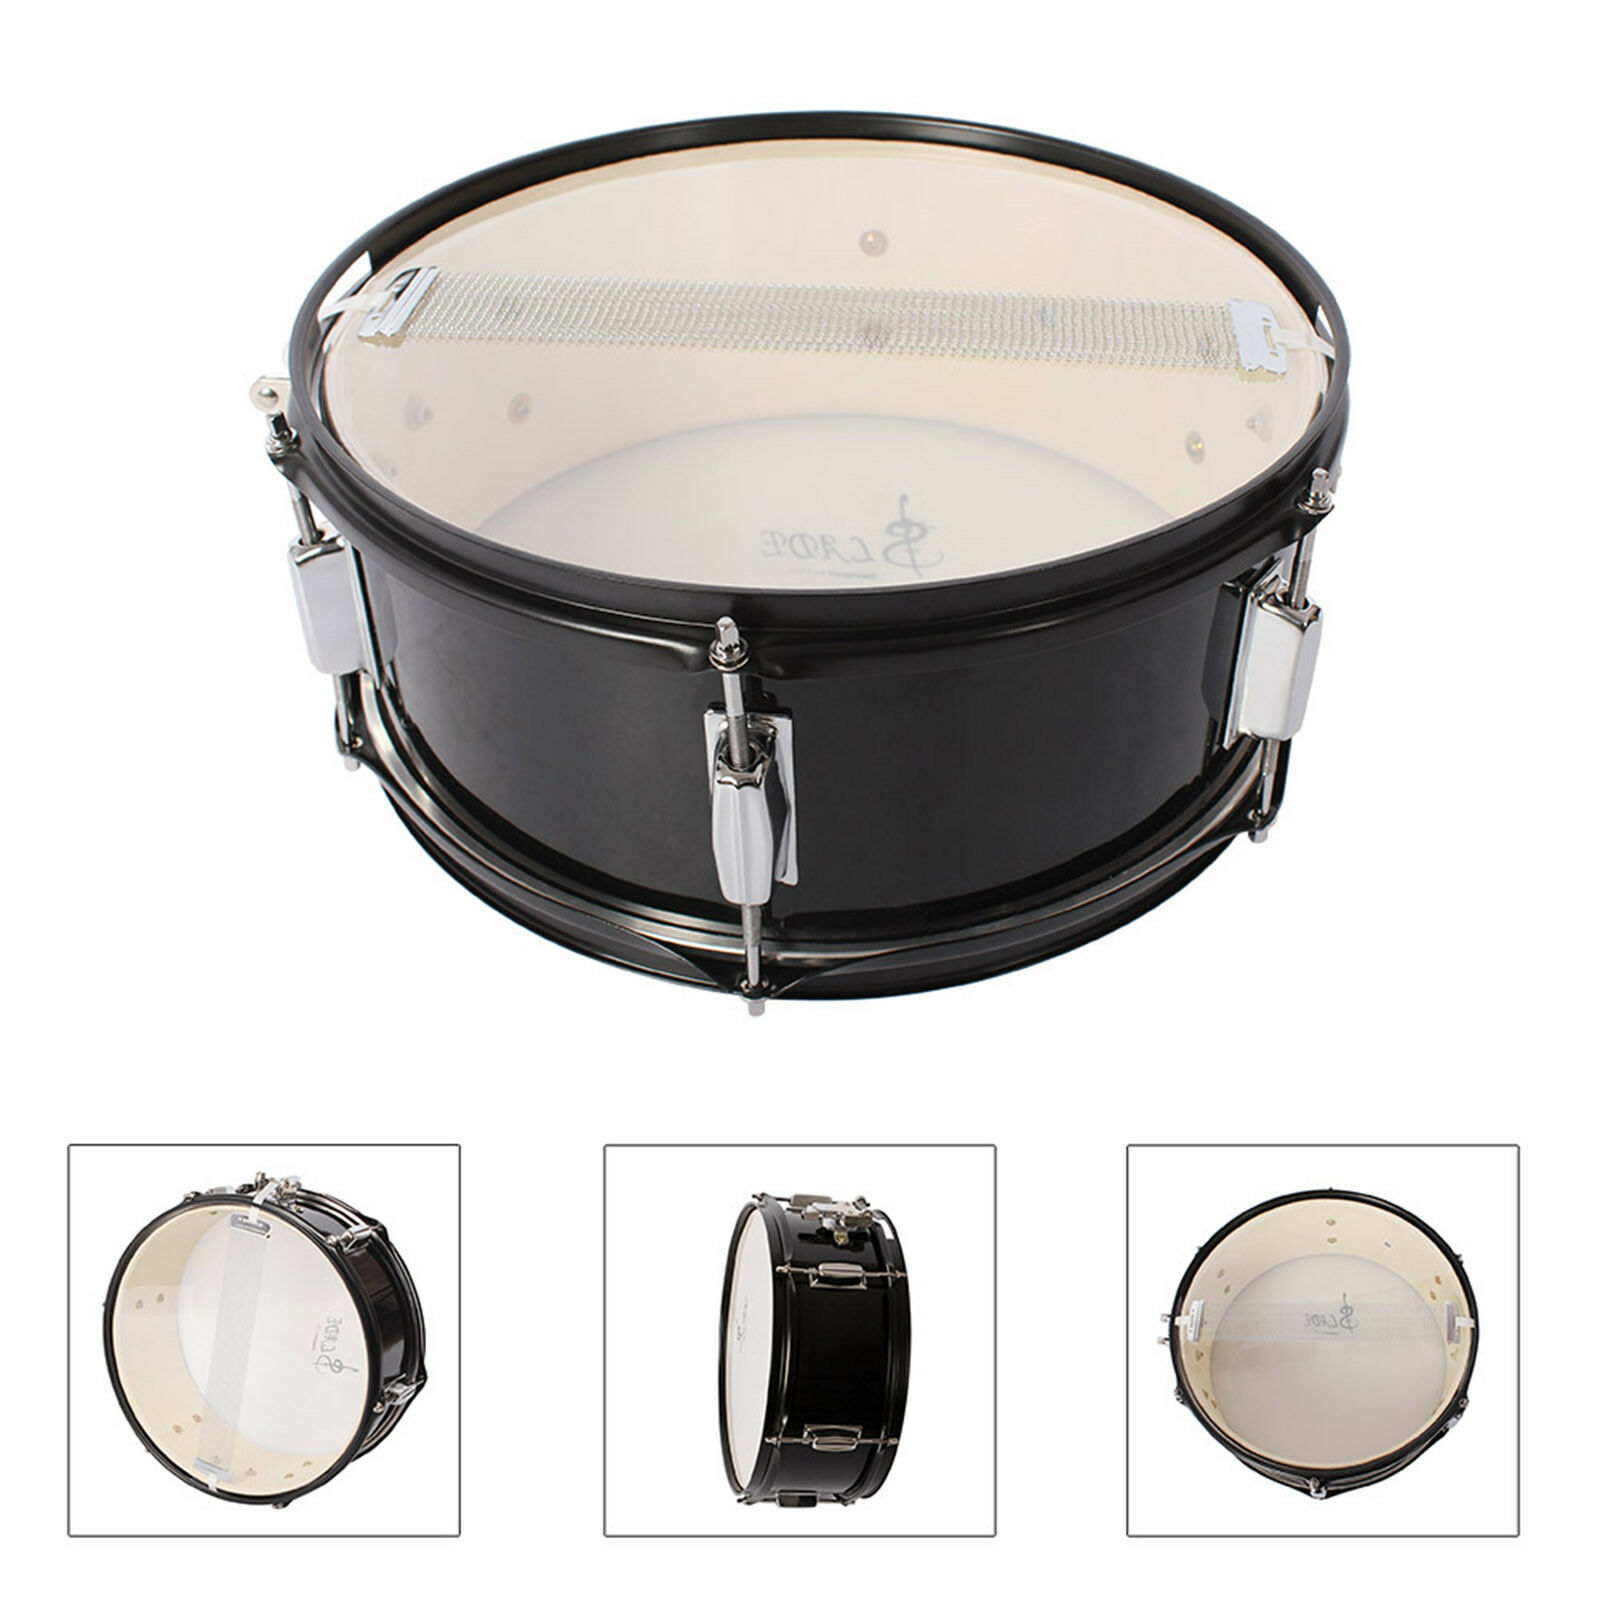 Großartig Snare Drum Drähte Bilder - Verdrahtungsideen - korsmi.info